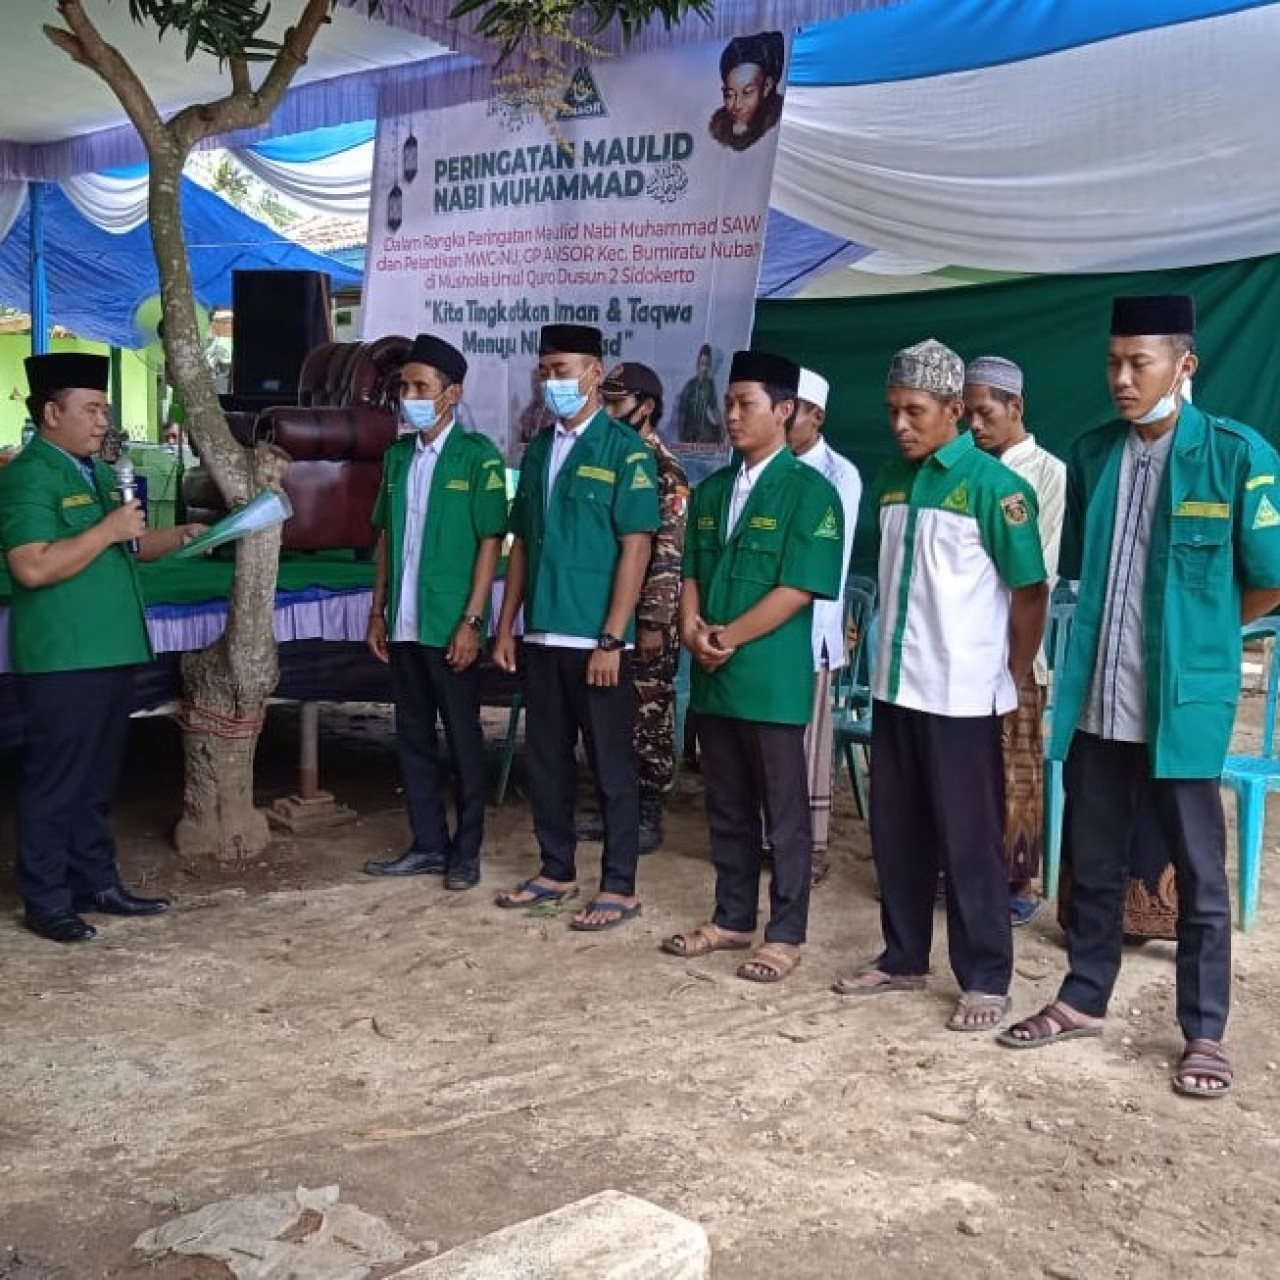 PAC GP Ansor Bumi Ratu Nuban Masa Khidmat 2021 – 2023 Resmi Dilantik